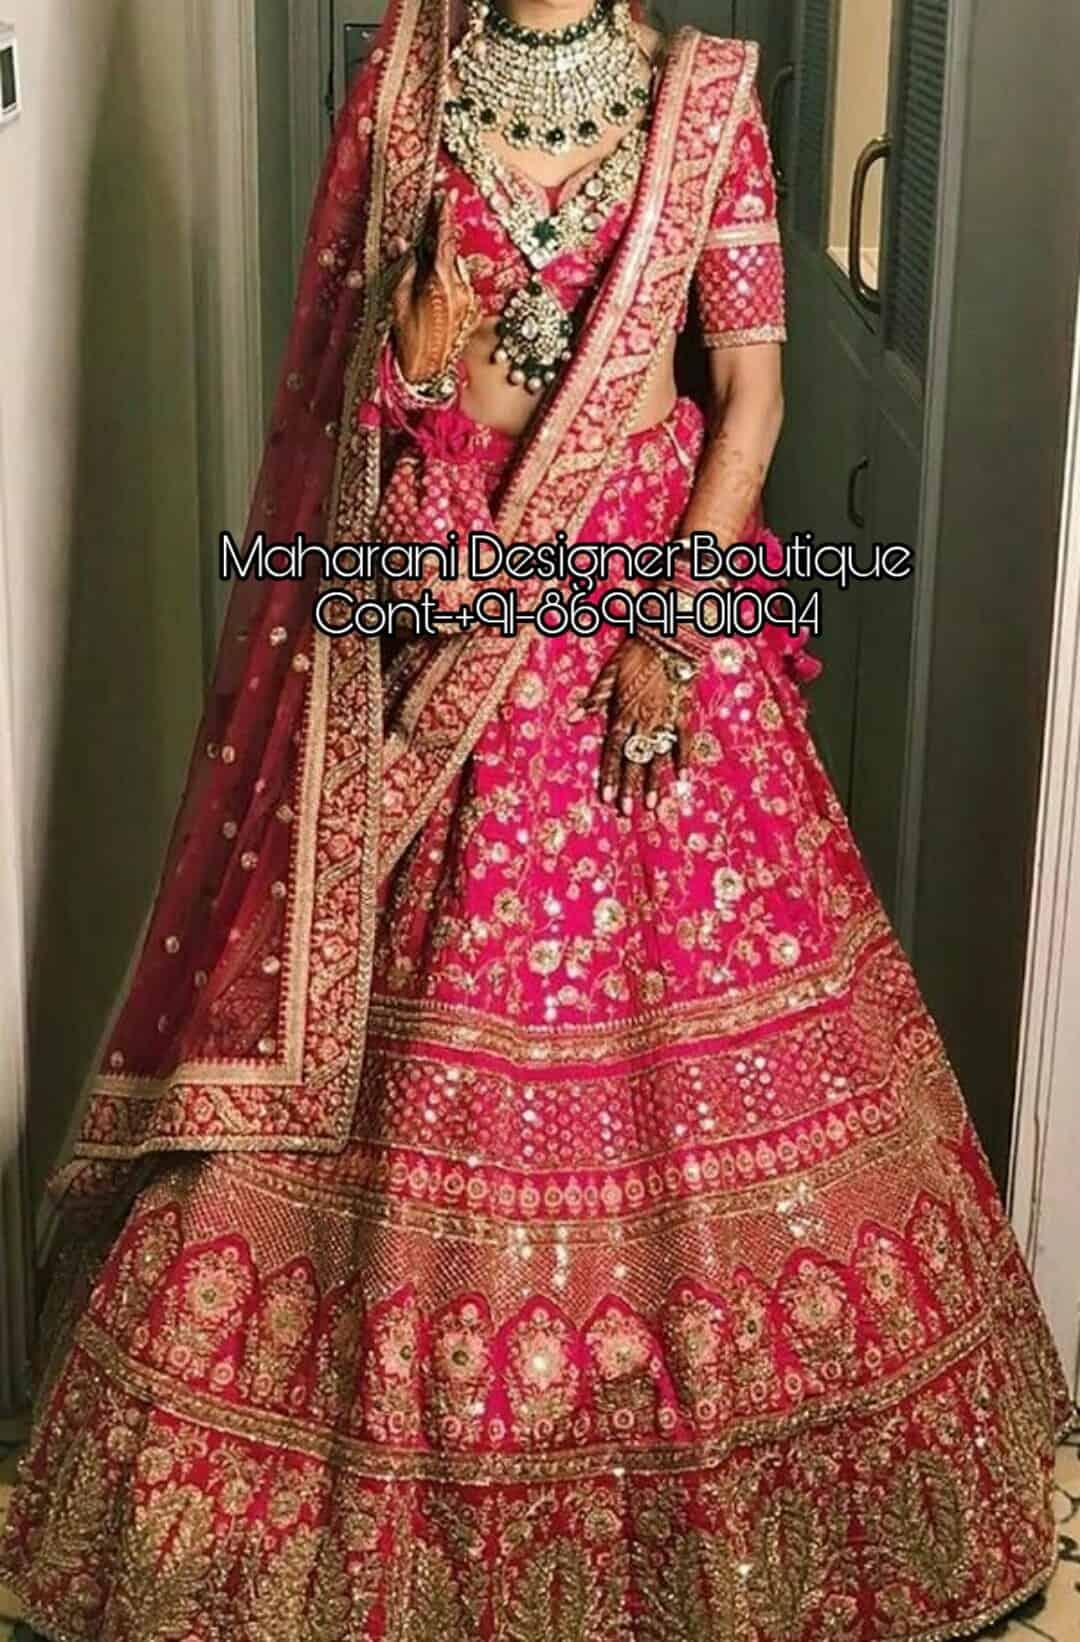 bcf03cf561 Bridal Lehenga Choli Buy Online, lehenga choli bridal images, lehenga choli  bridal with price